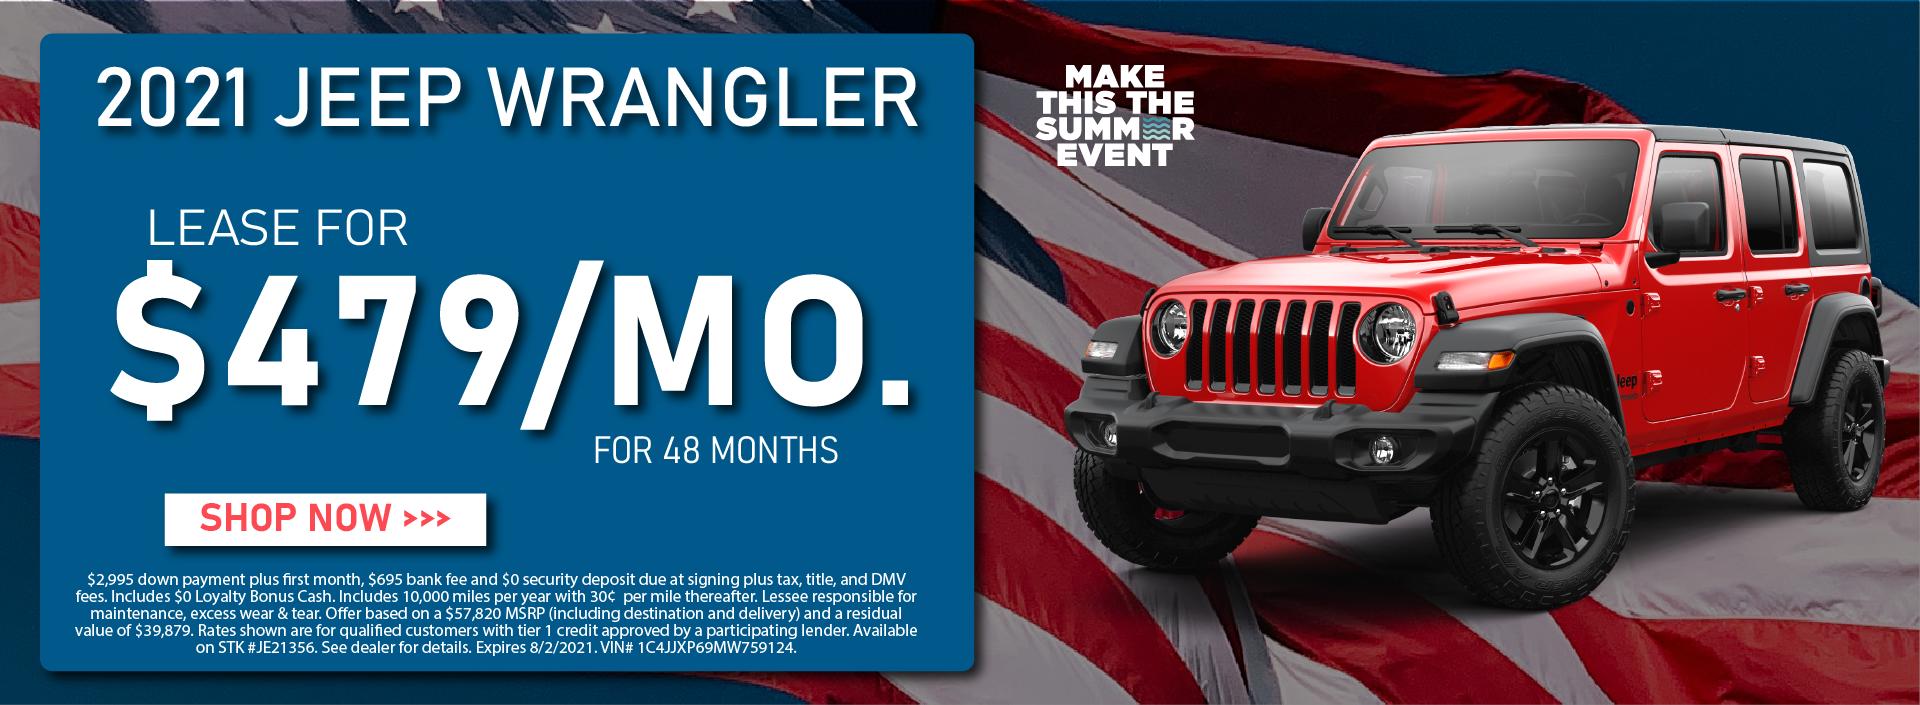 CDJR Manhattan – July 2021 – Jeep Wrangler